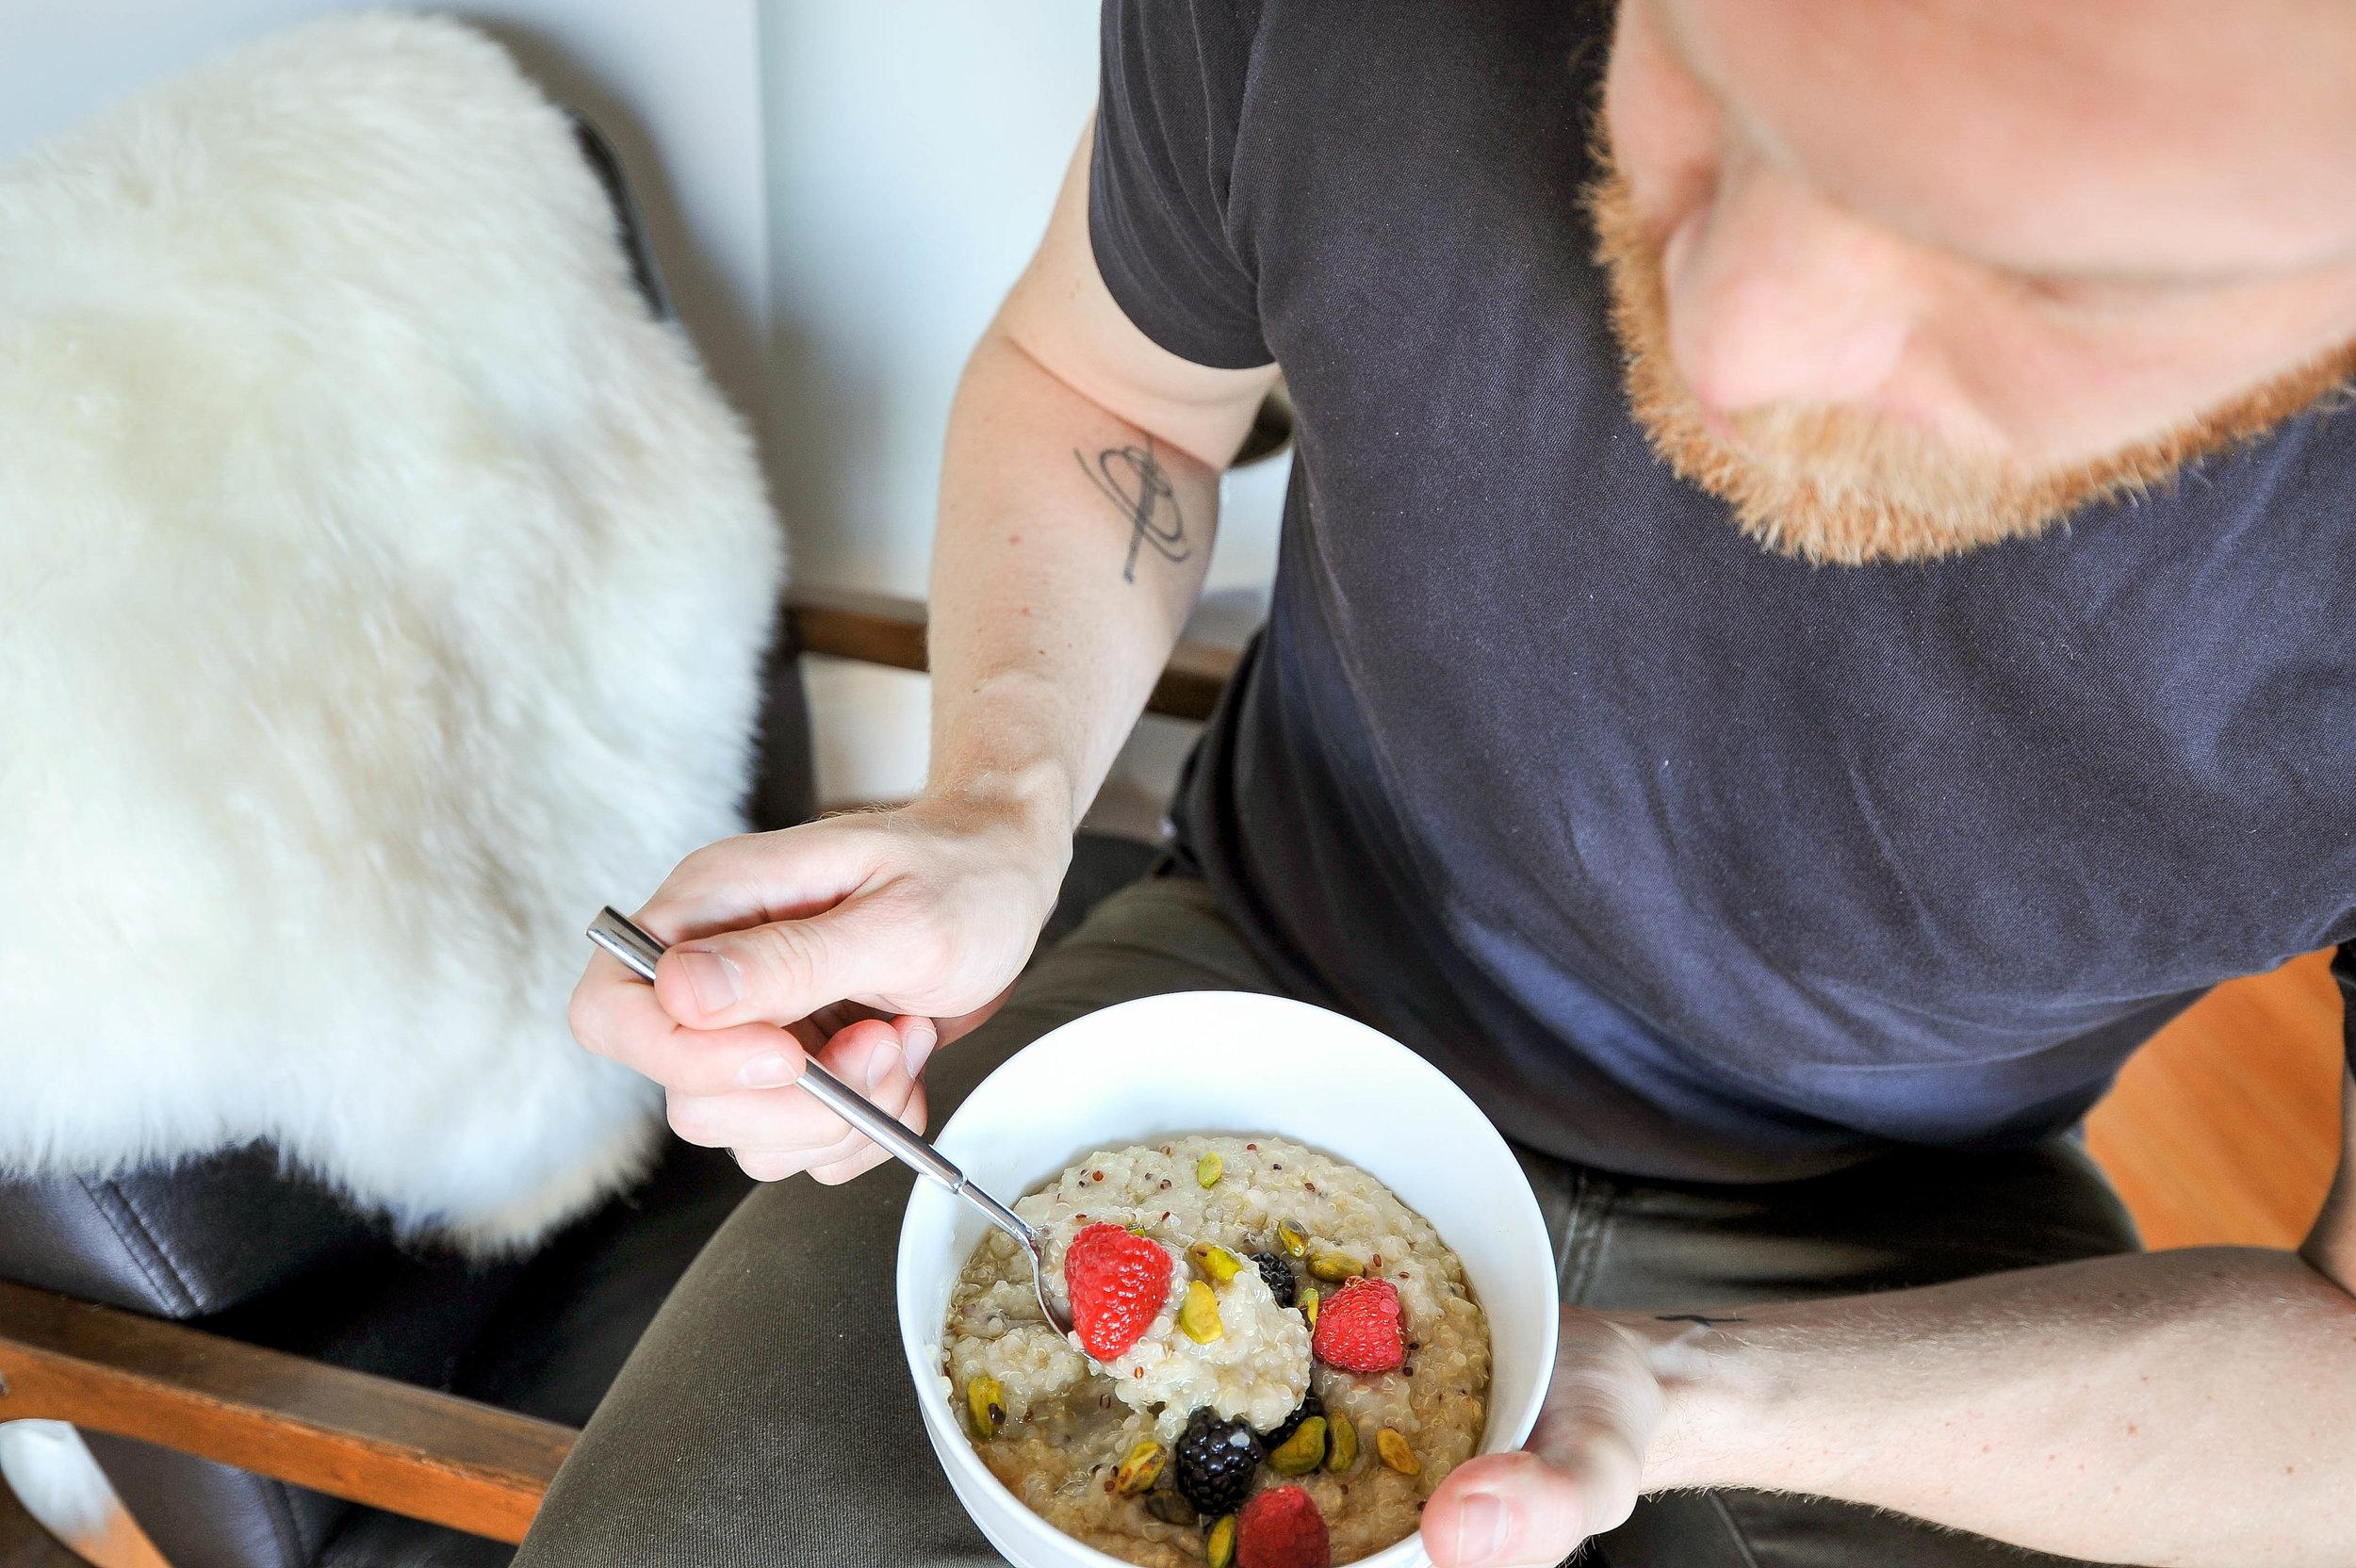 thomassengstrom_Malibu Farm_Quinoa-Oatmeal-Cereal-6.jpg